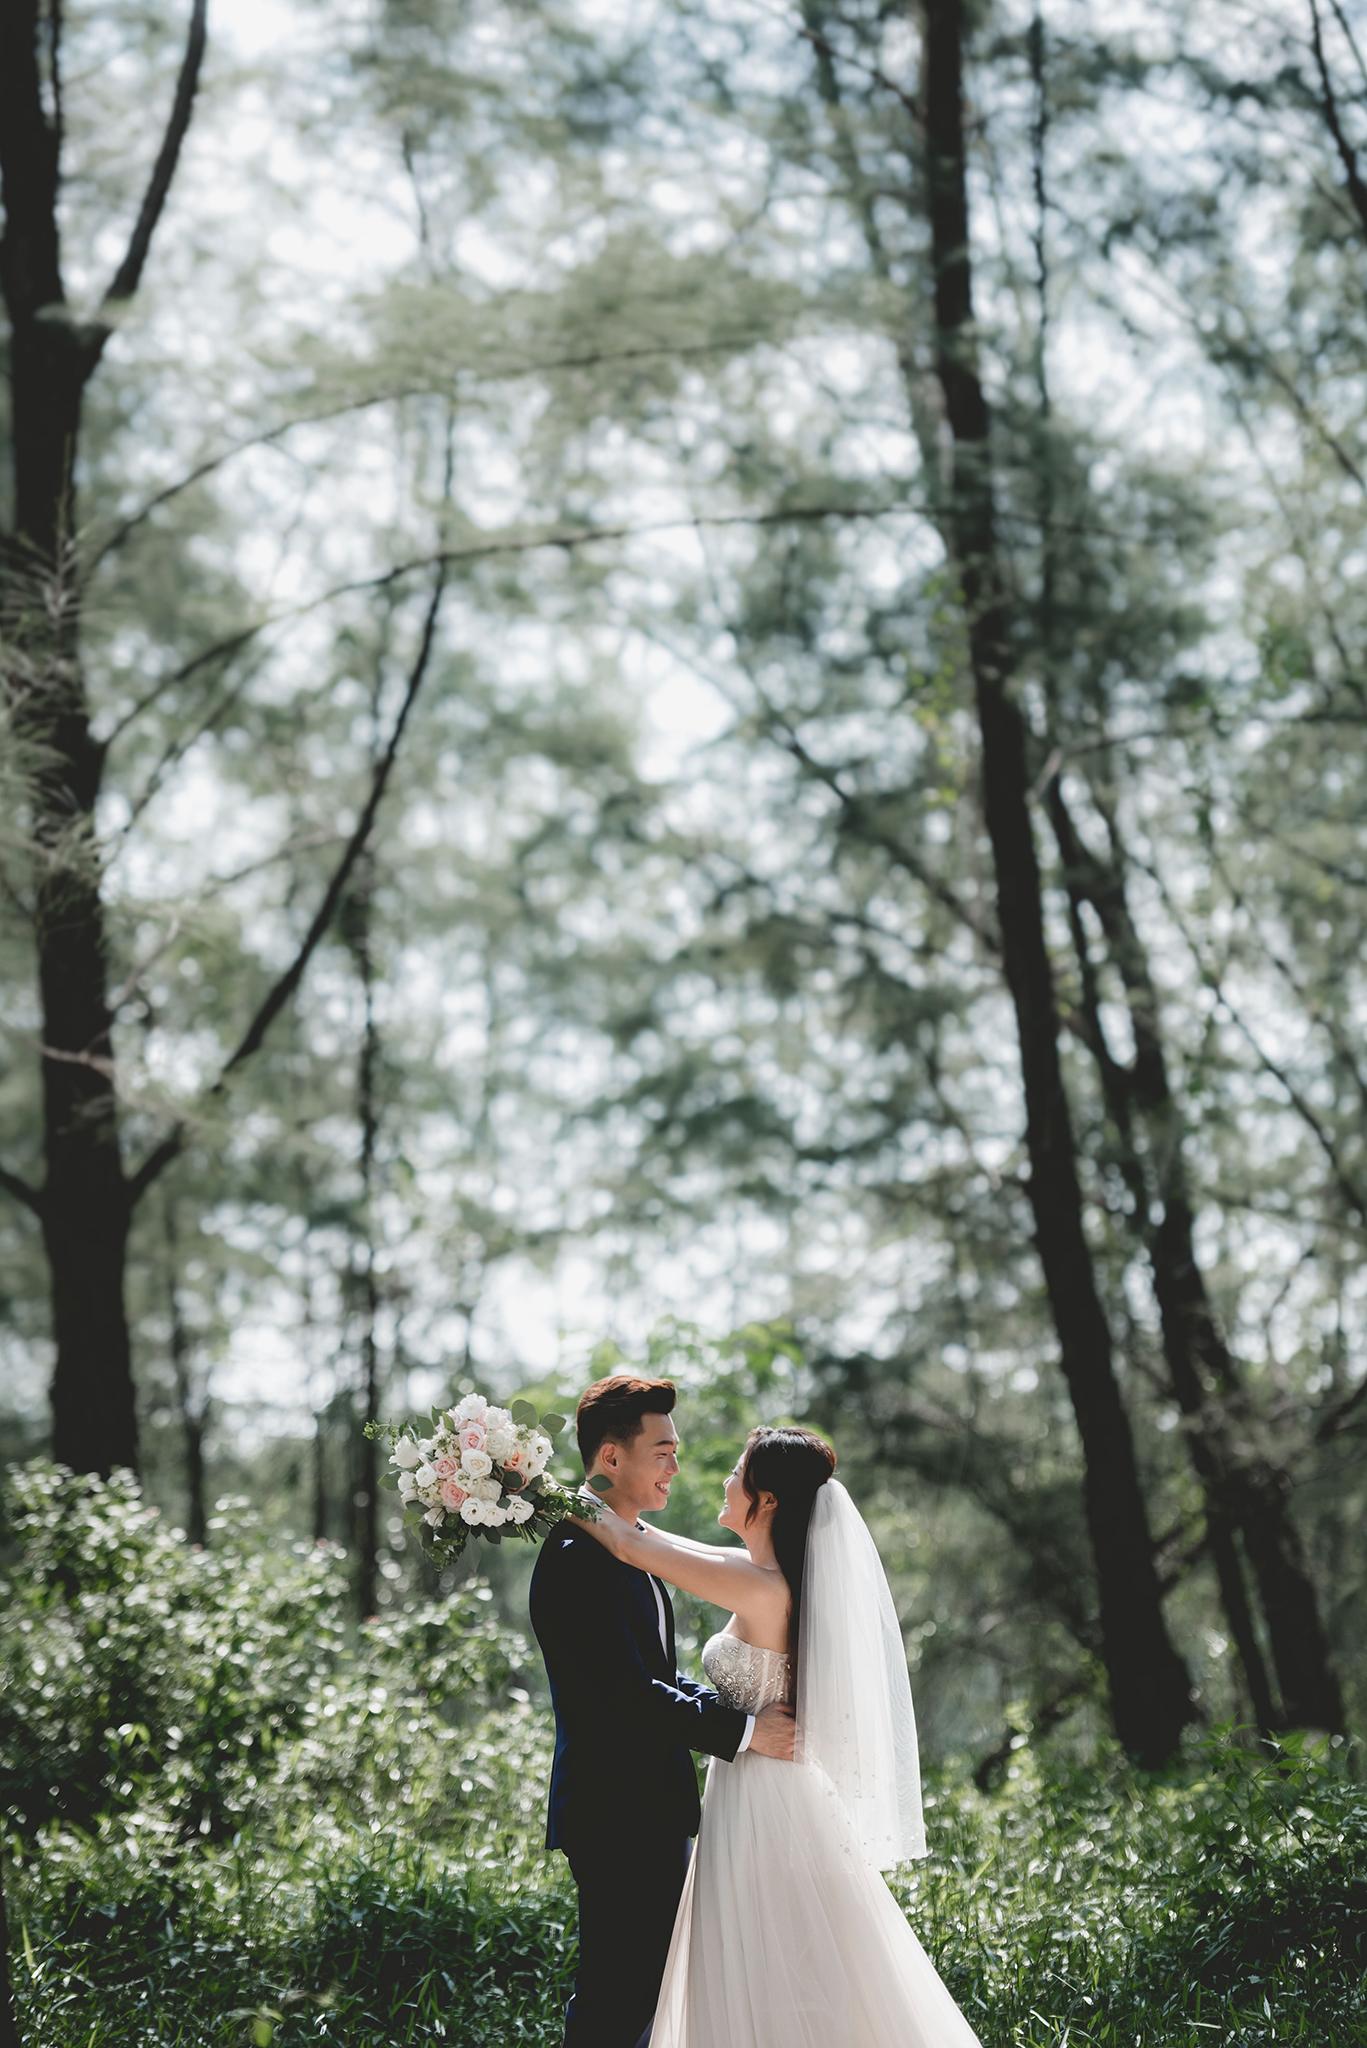 Pre wedding cony island 003.JPG